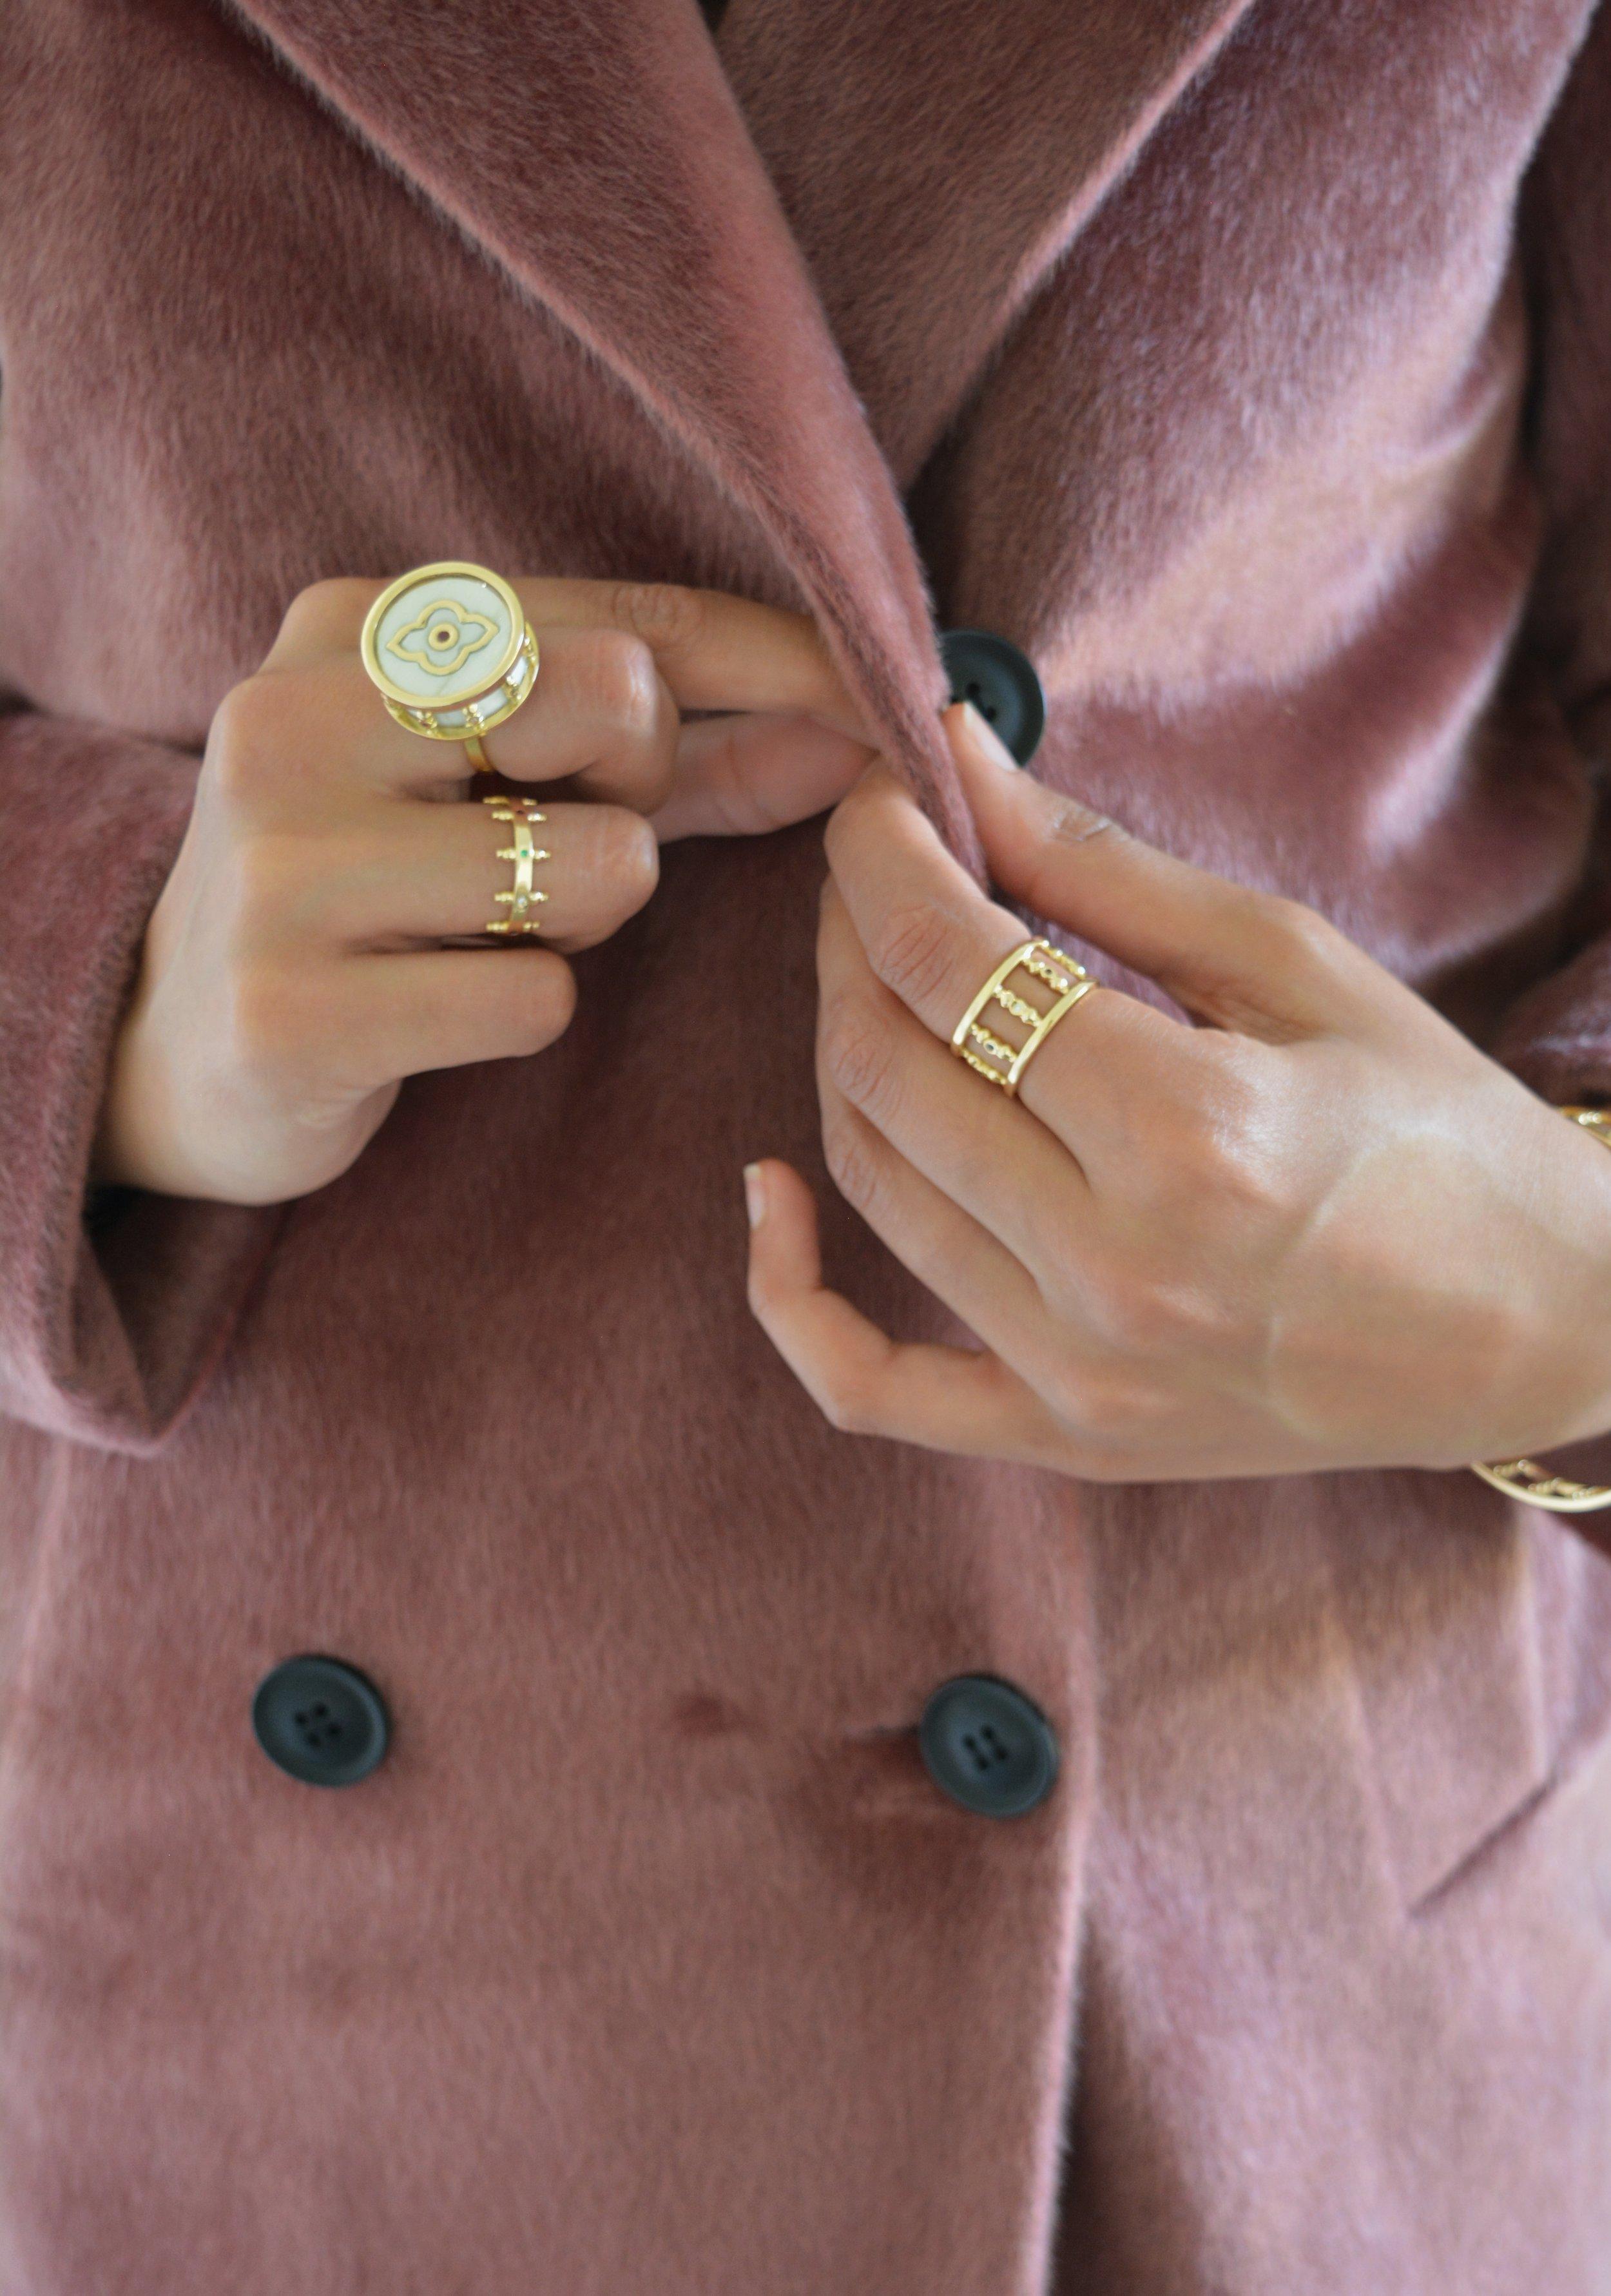 Arabesque/crown/roma rings